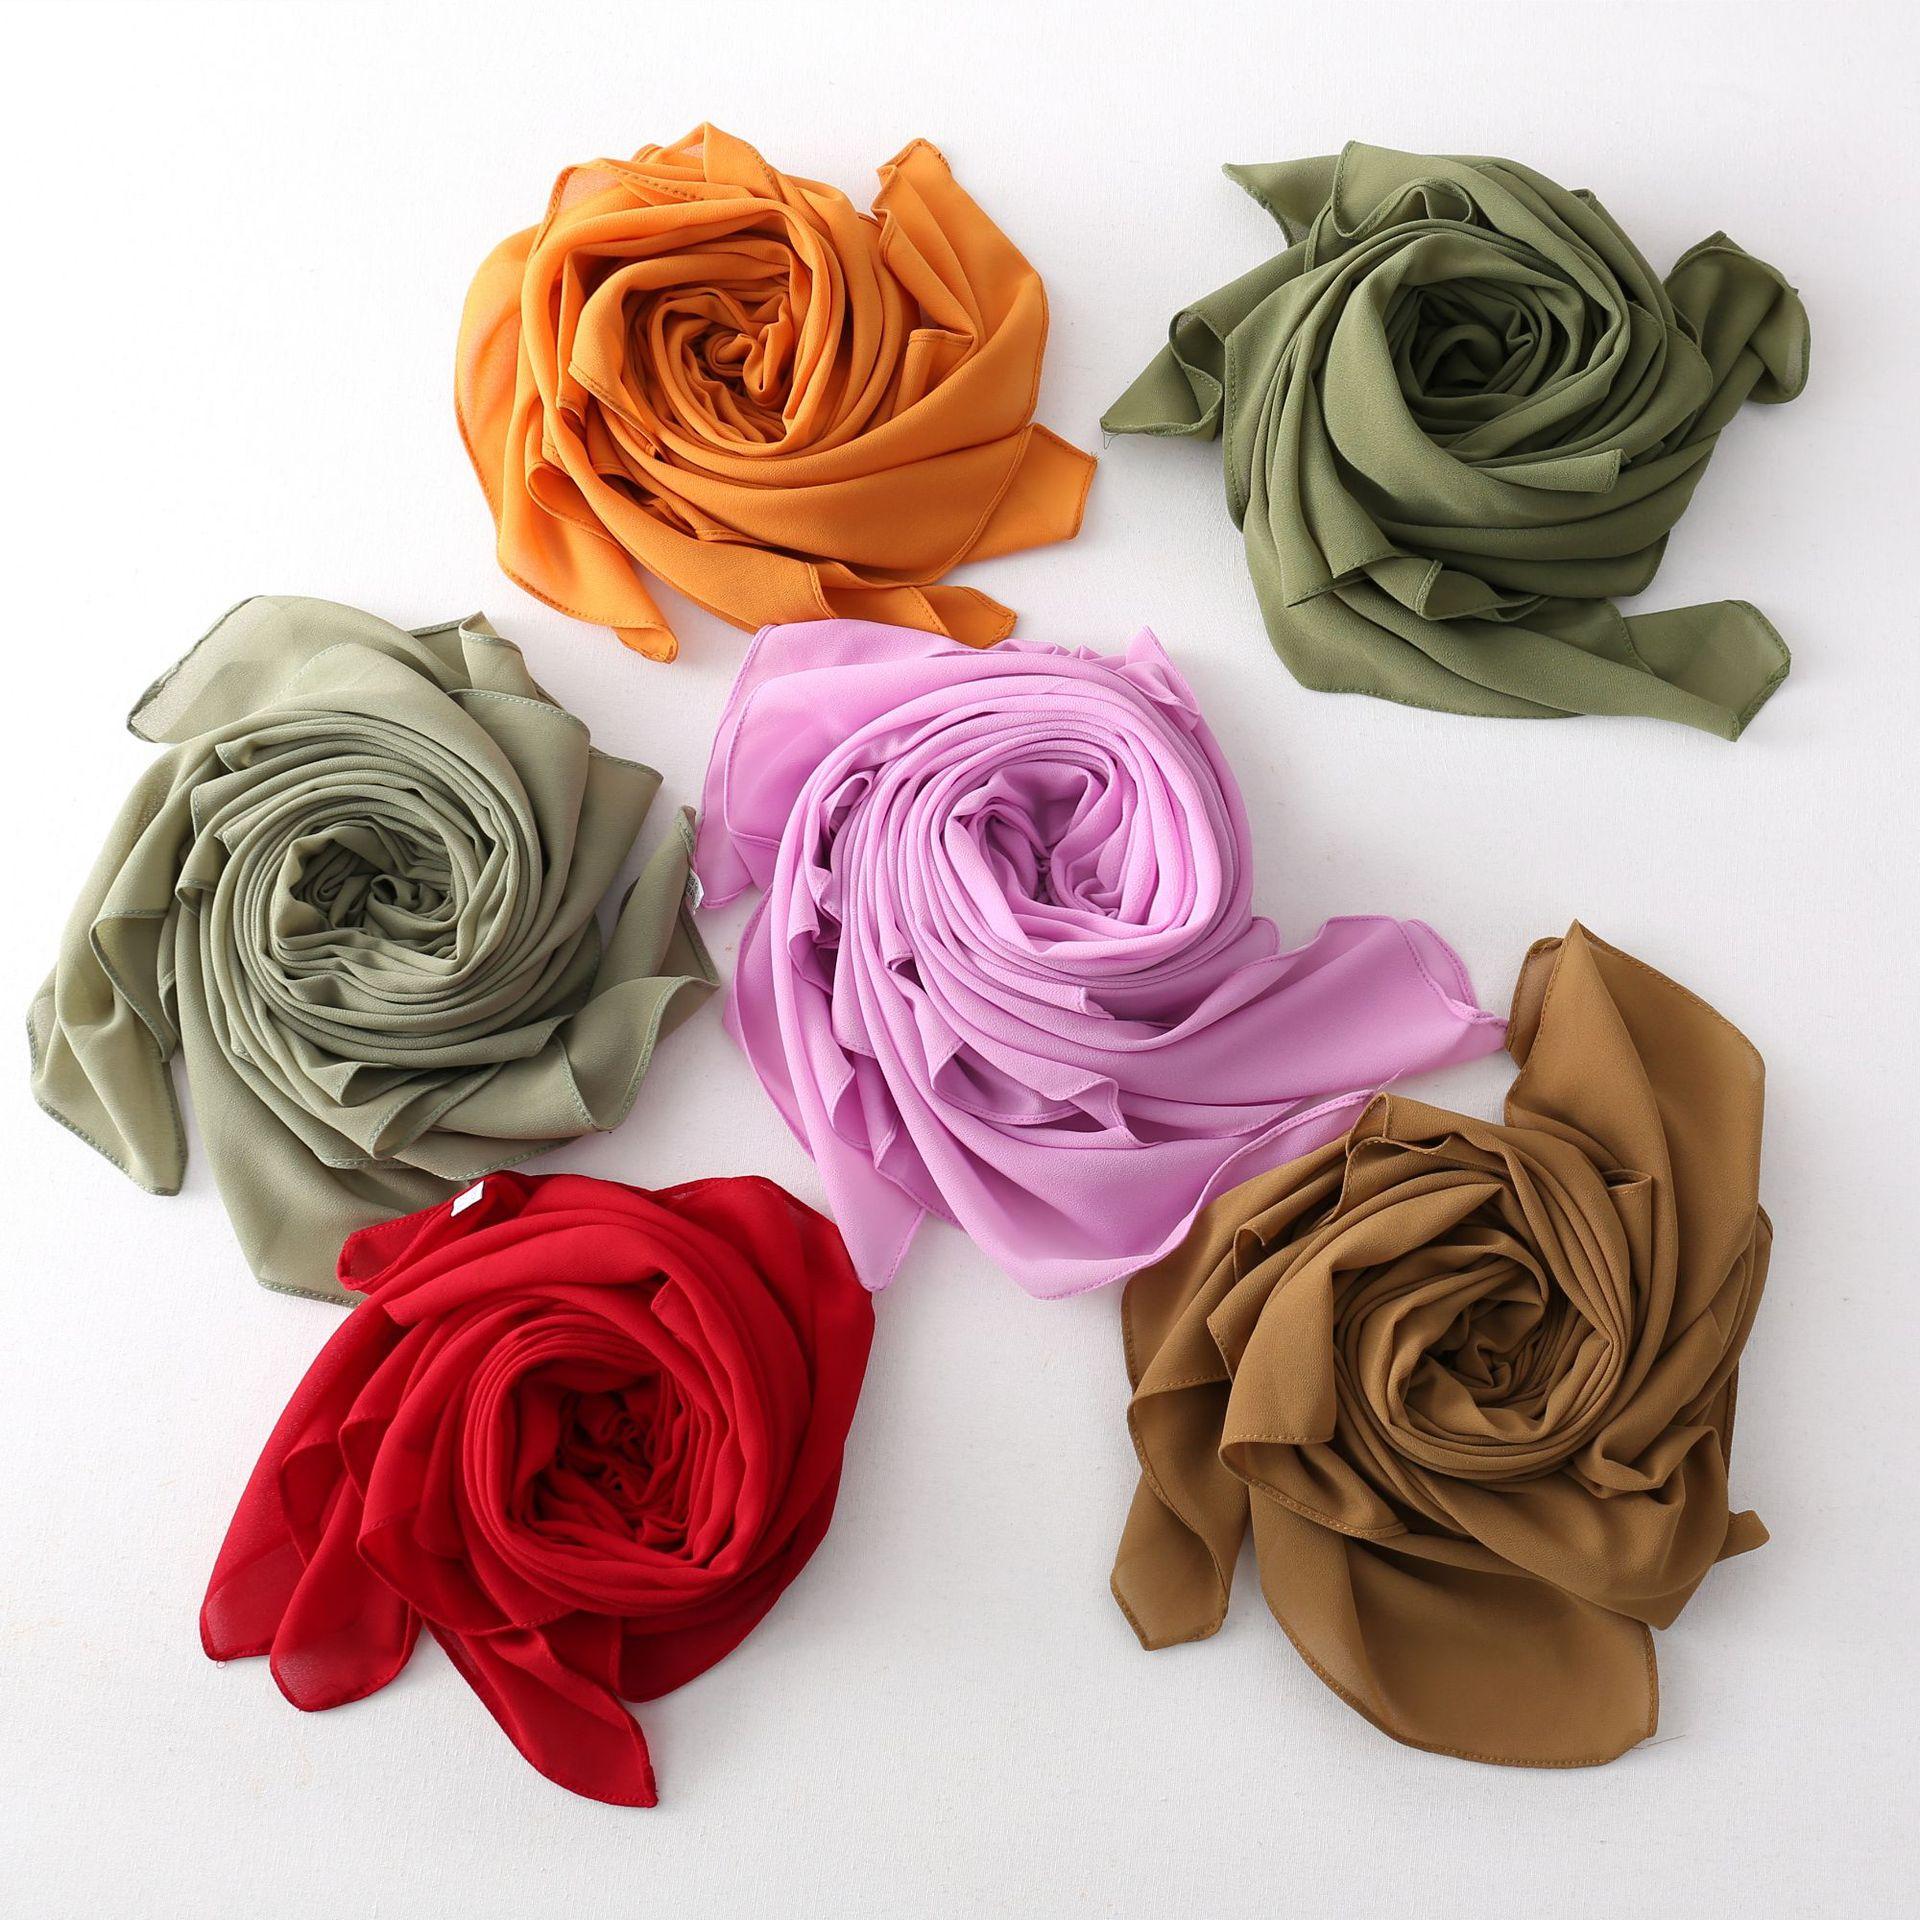 110*110cm Square Muslim Chiffon Hijab Scarf Women Malaysiya Hijabs Scarves Turban Plain Islamic Shawls and Wraps Headband Femme premium floral printed chiffon hijab scarf women muslim headscarf shawls and wraps islamic scarves turban headband foulard femme